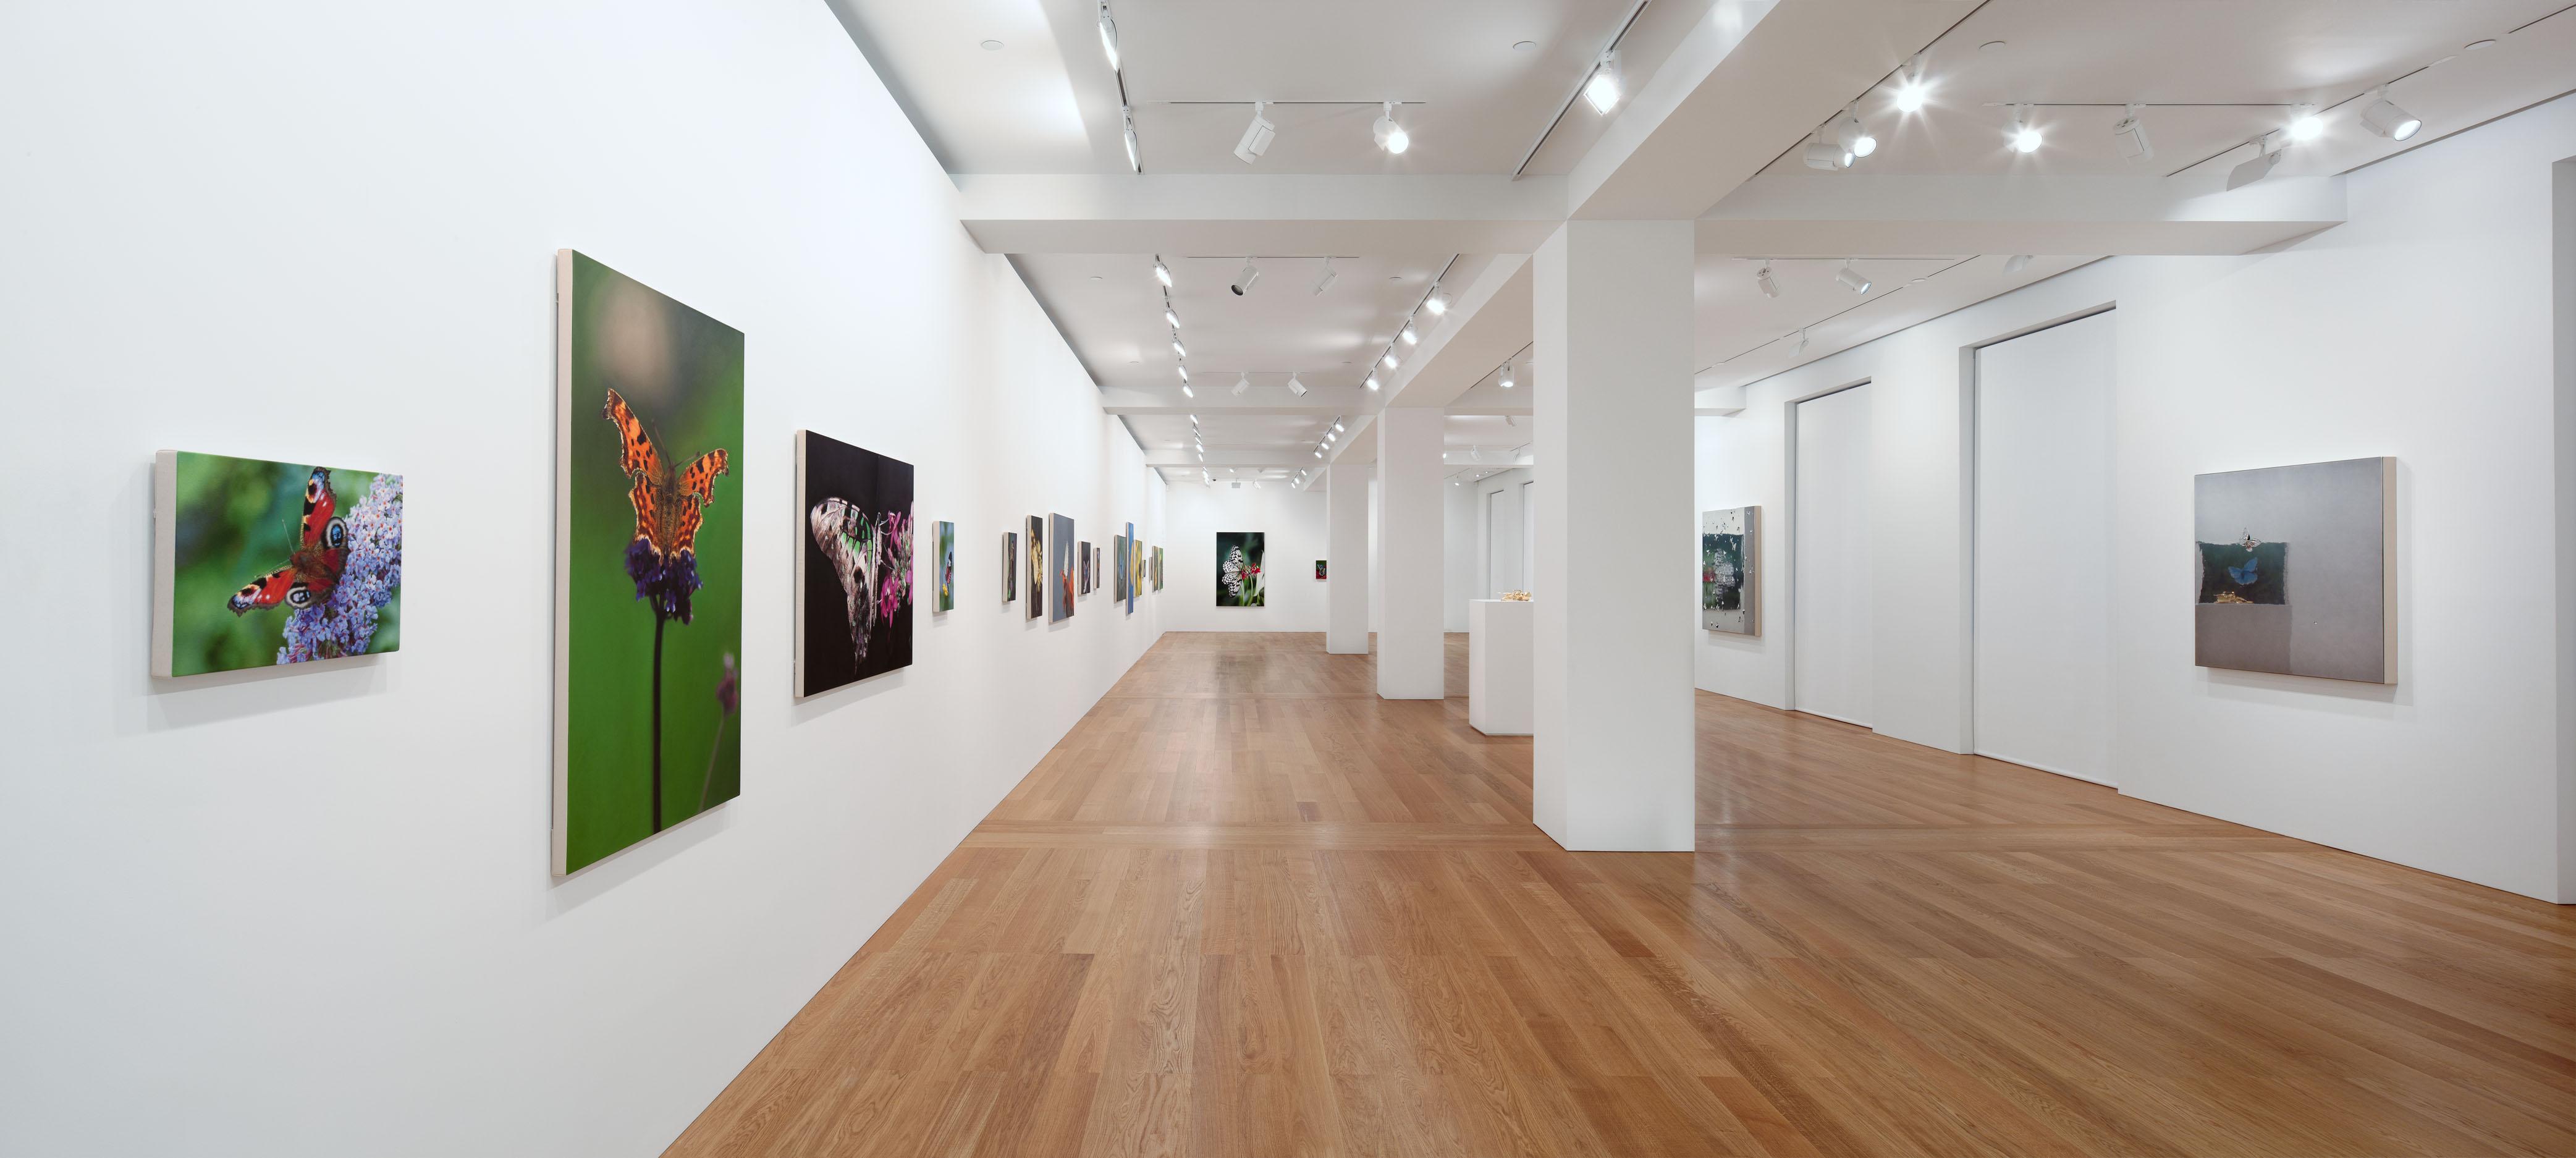 Http Arrestedmotion Com 2011 01 Showing Damien Hirst Forgotten Promises Gagosian Hong Kong Gallery Shot 17